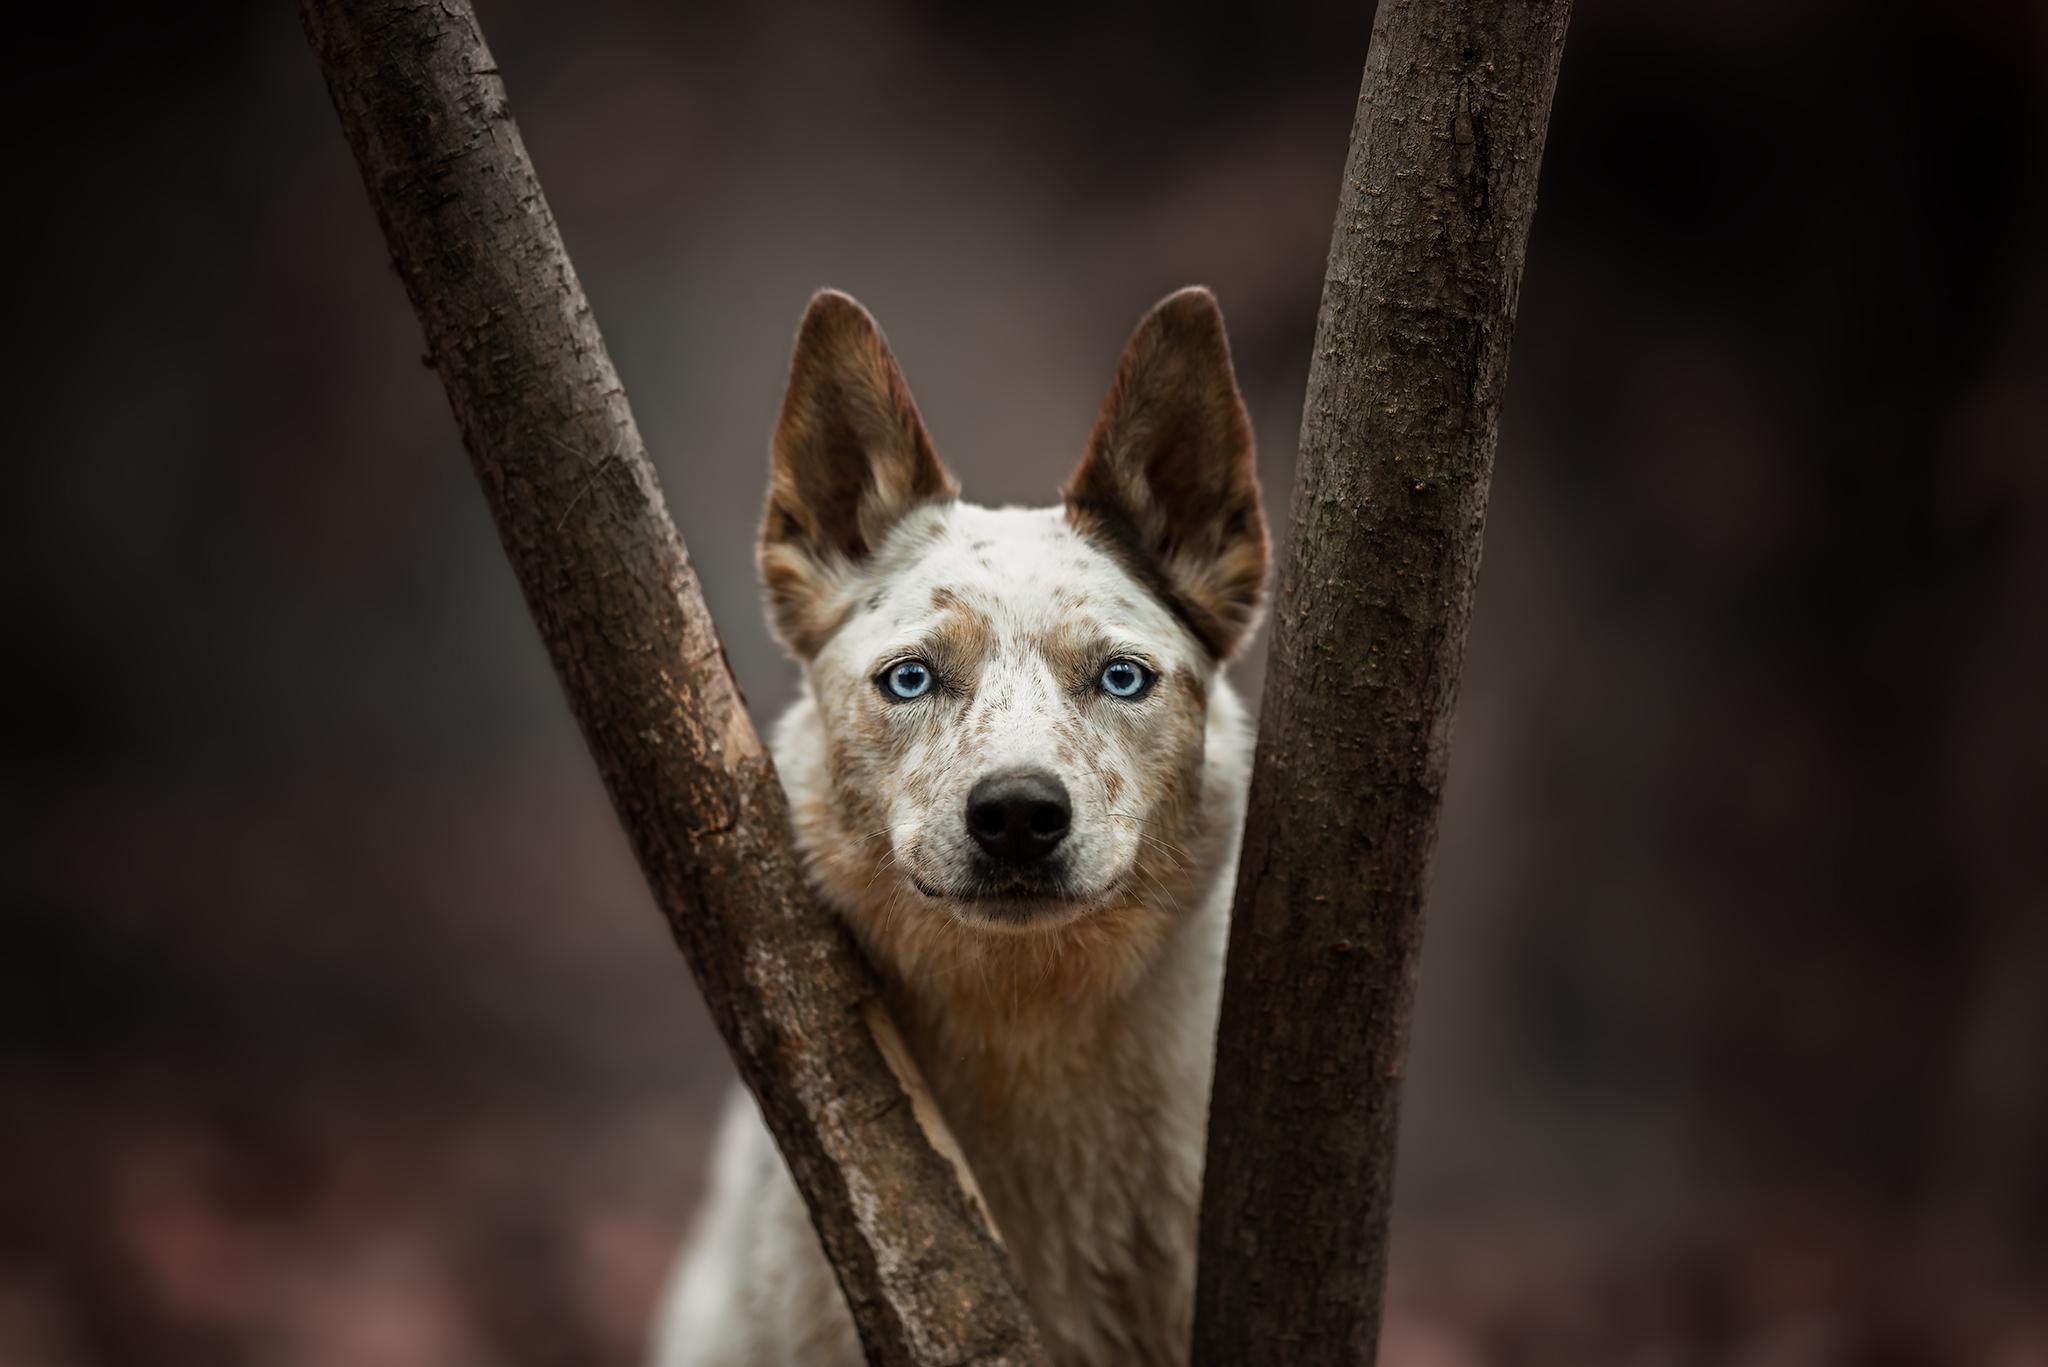 Dog between tree